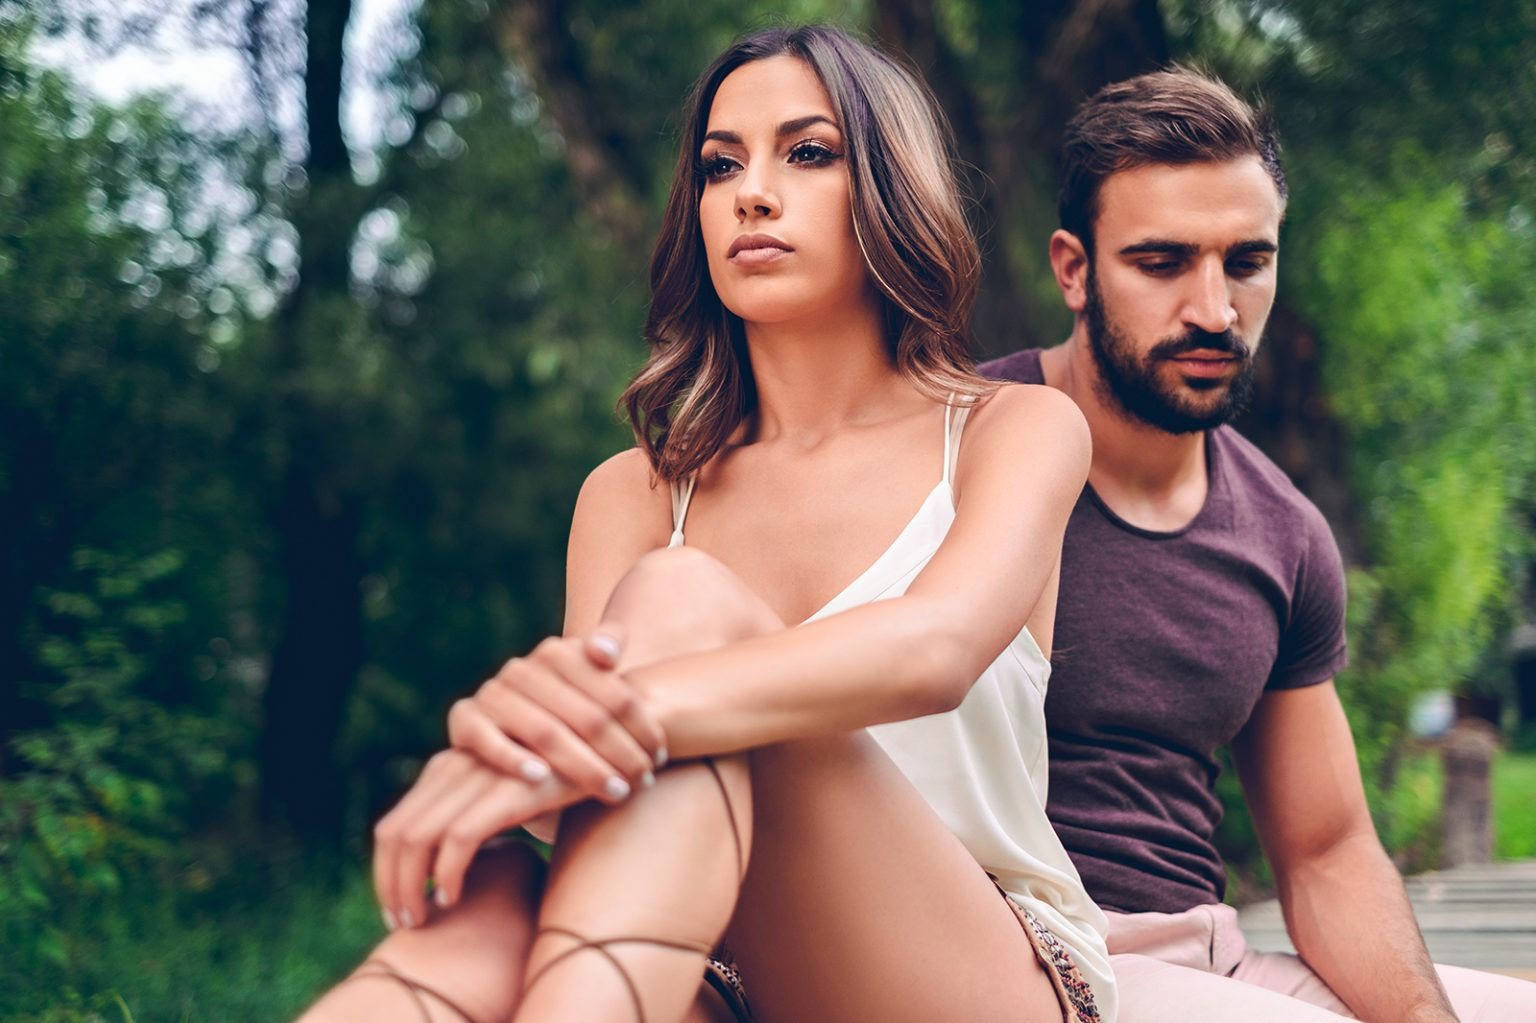 Rückzug: Go Or No-Go - Wie Reagieren Männer, Wenn Frauen